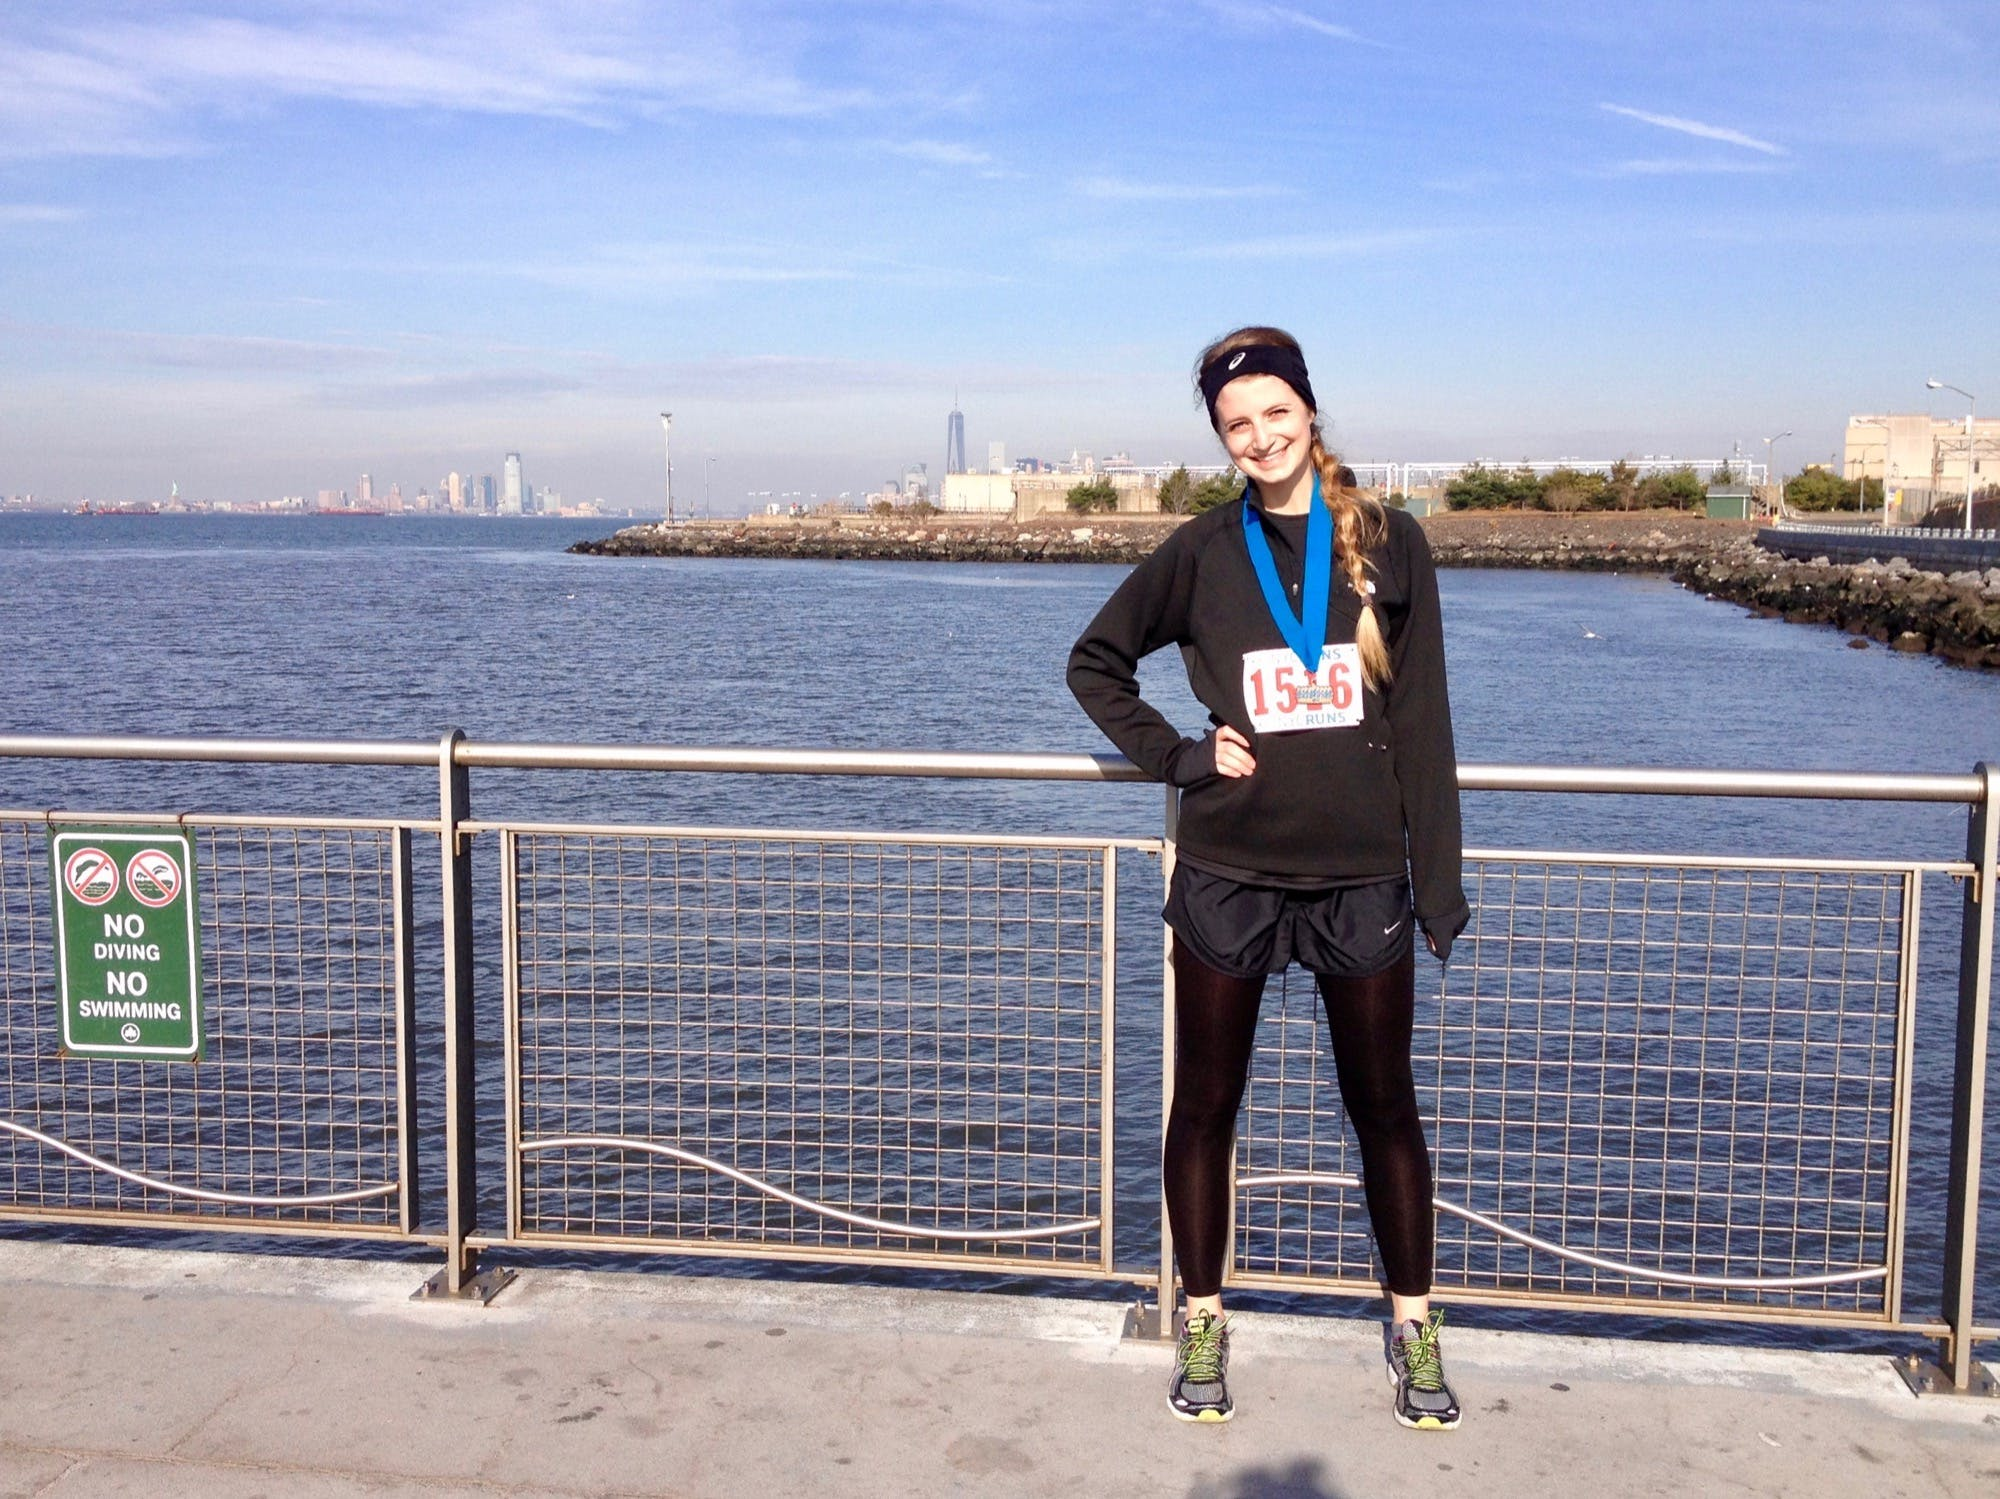 Amanda Kievet's first half marathon